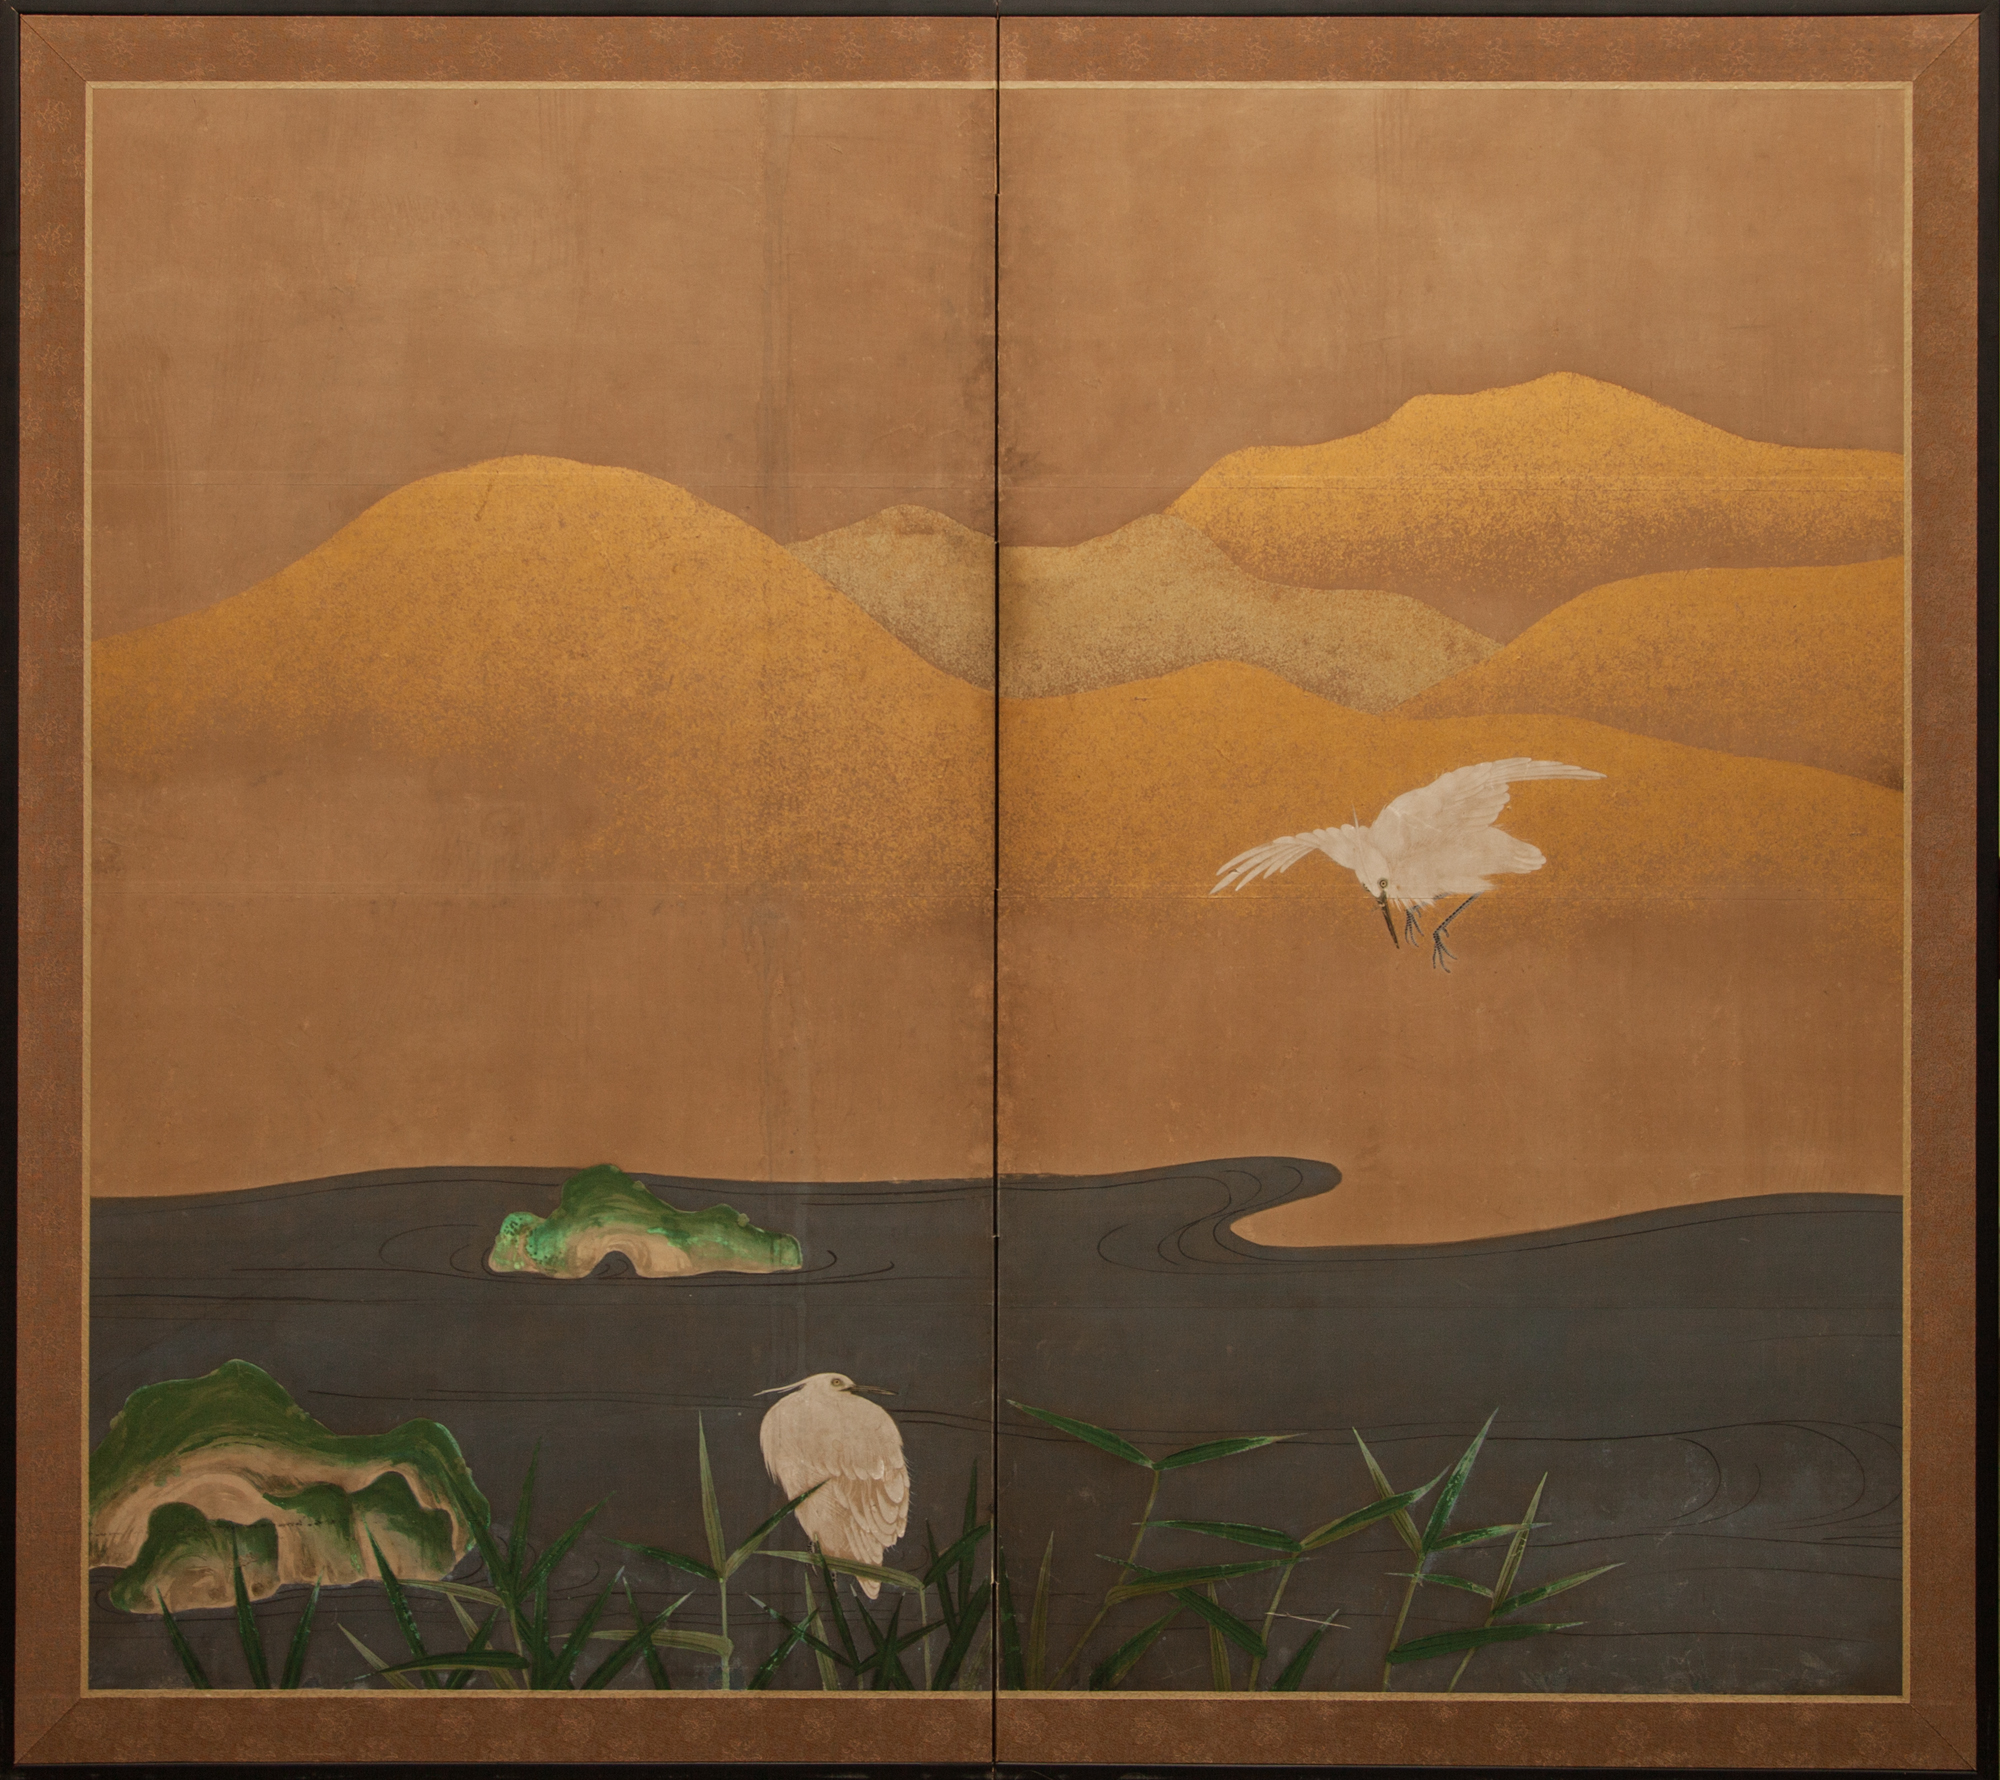 Japanese Two Panel Screen: Herons at Water's Edge